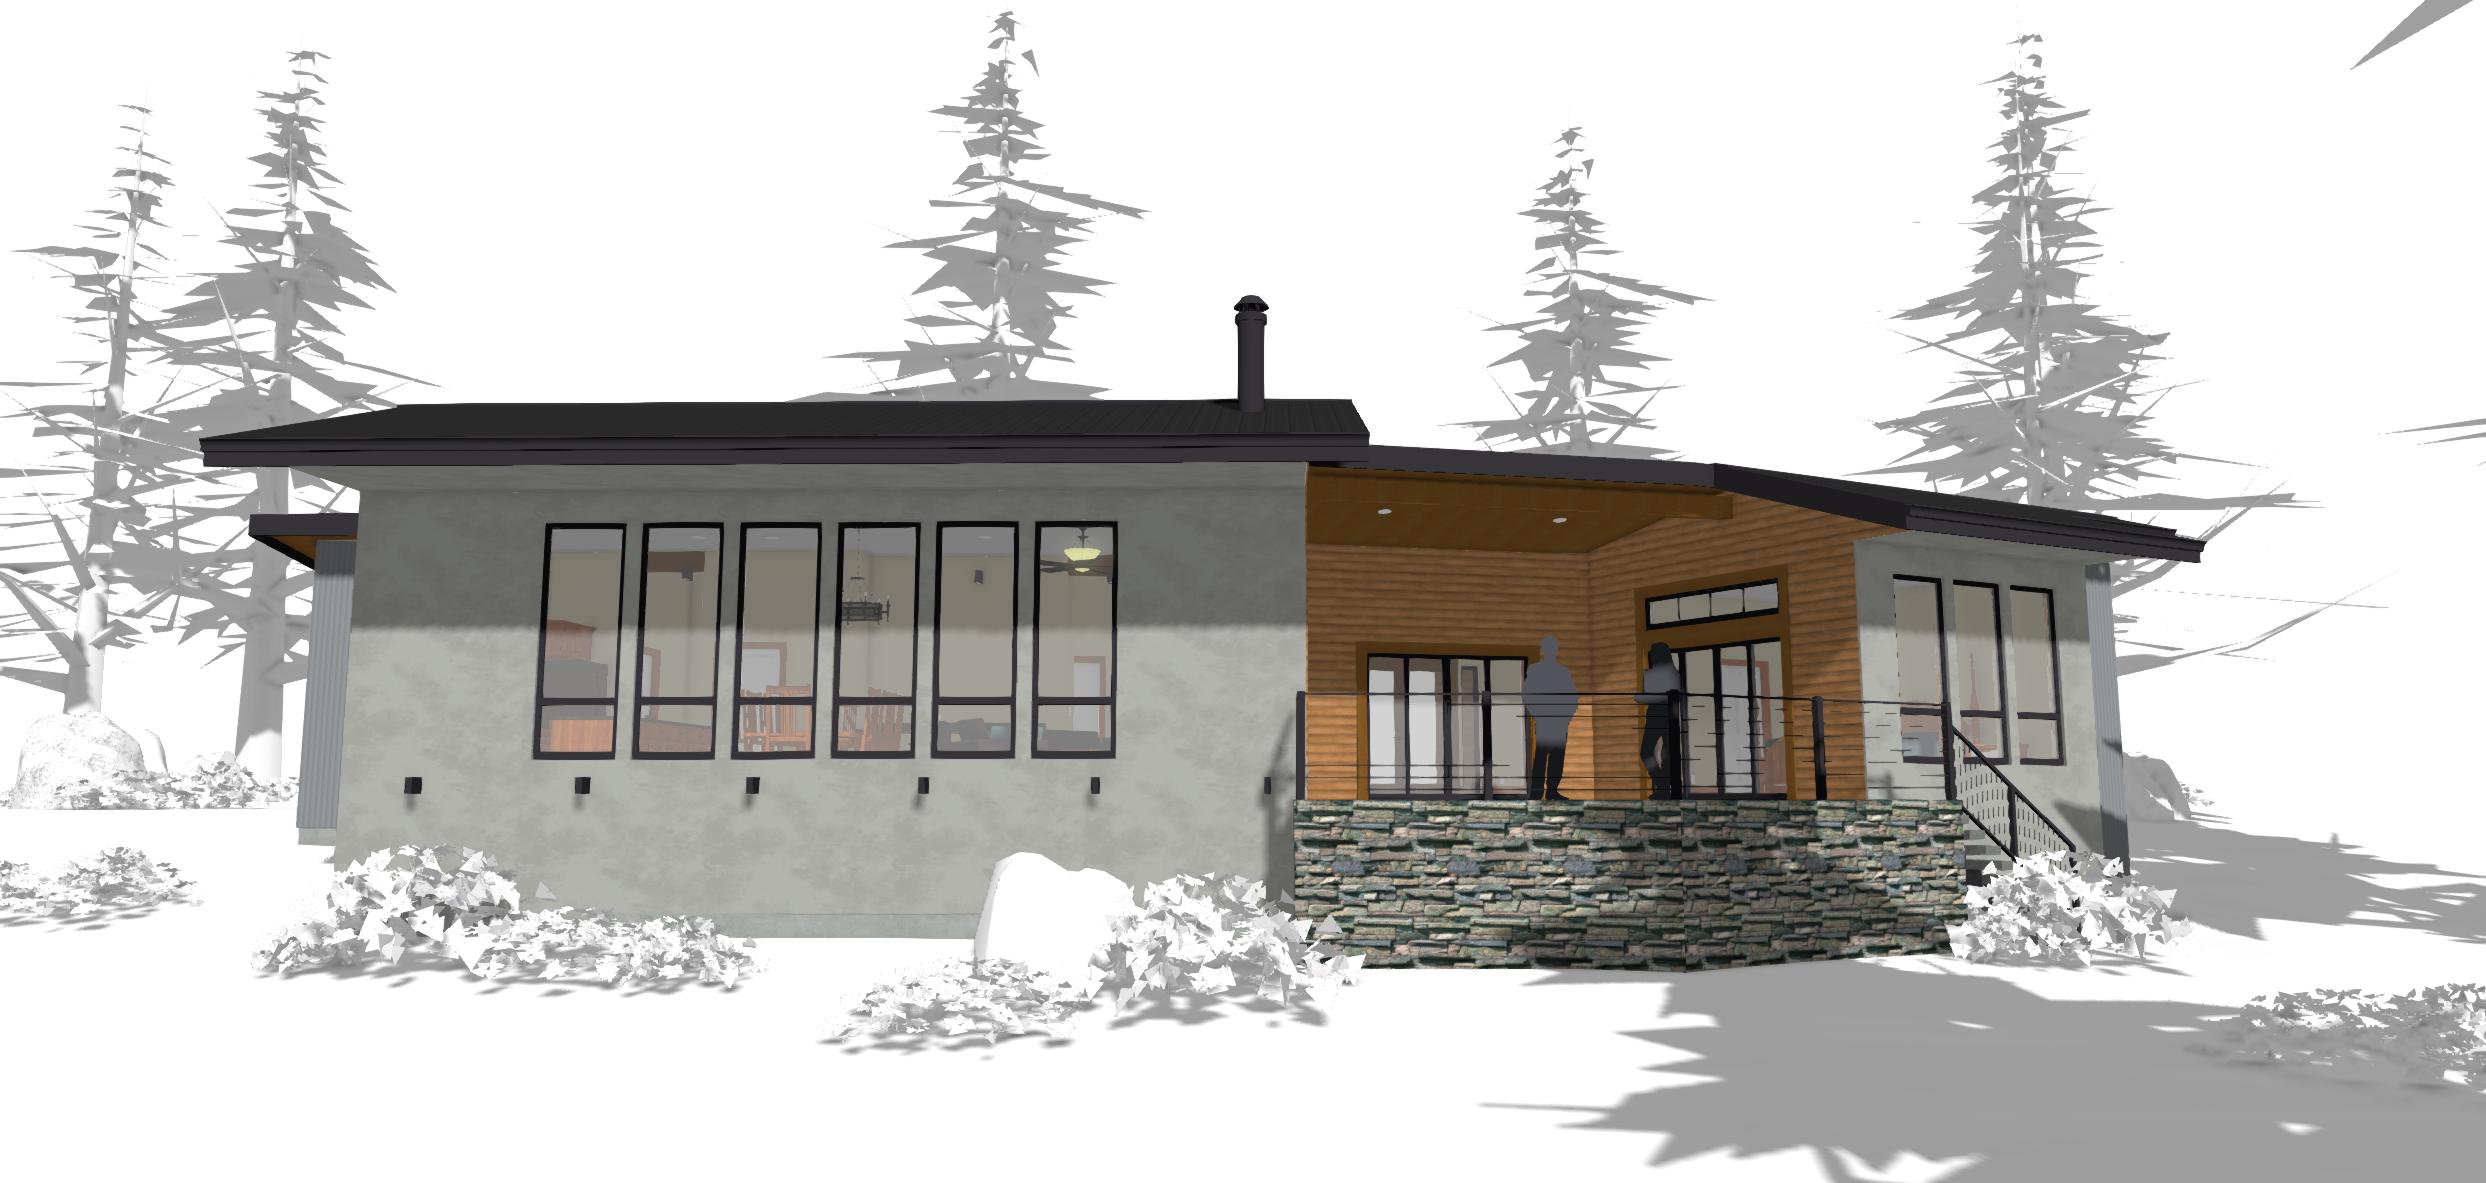 Energy efficient design for mountain living